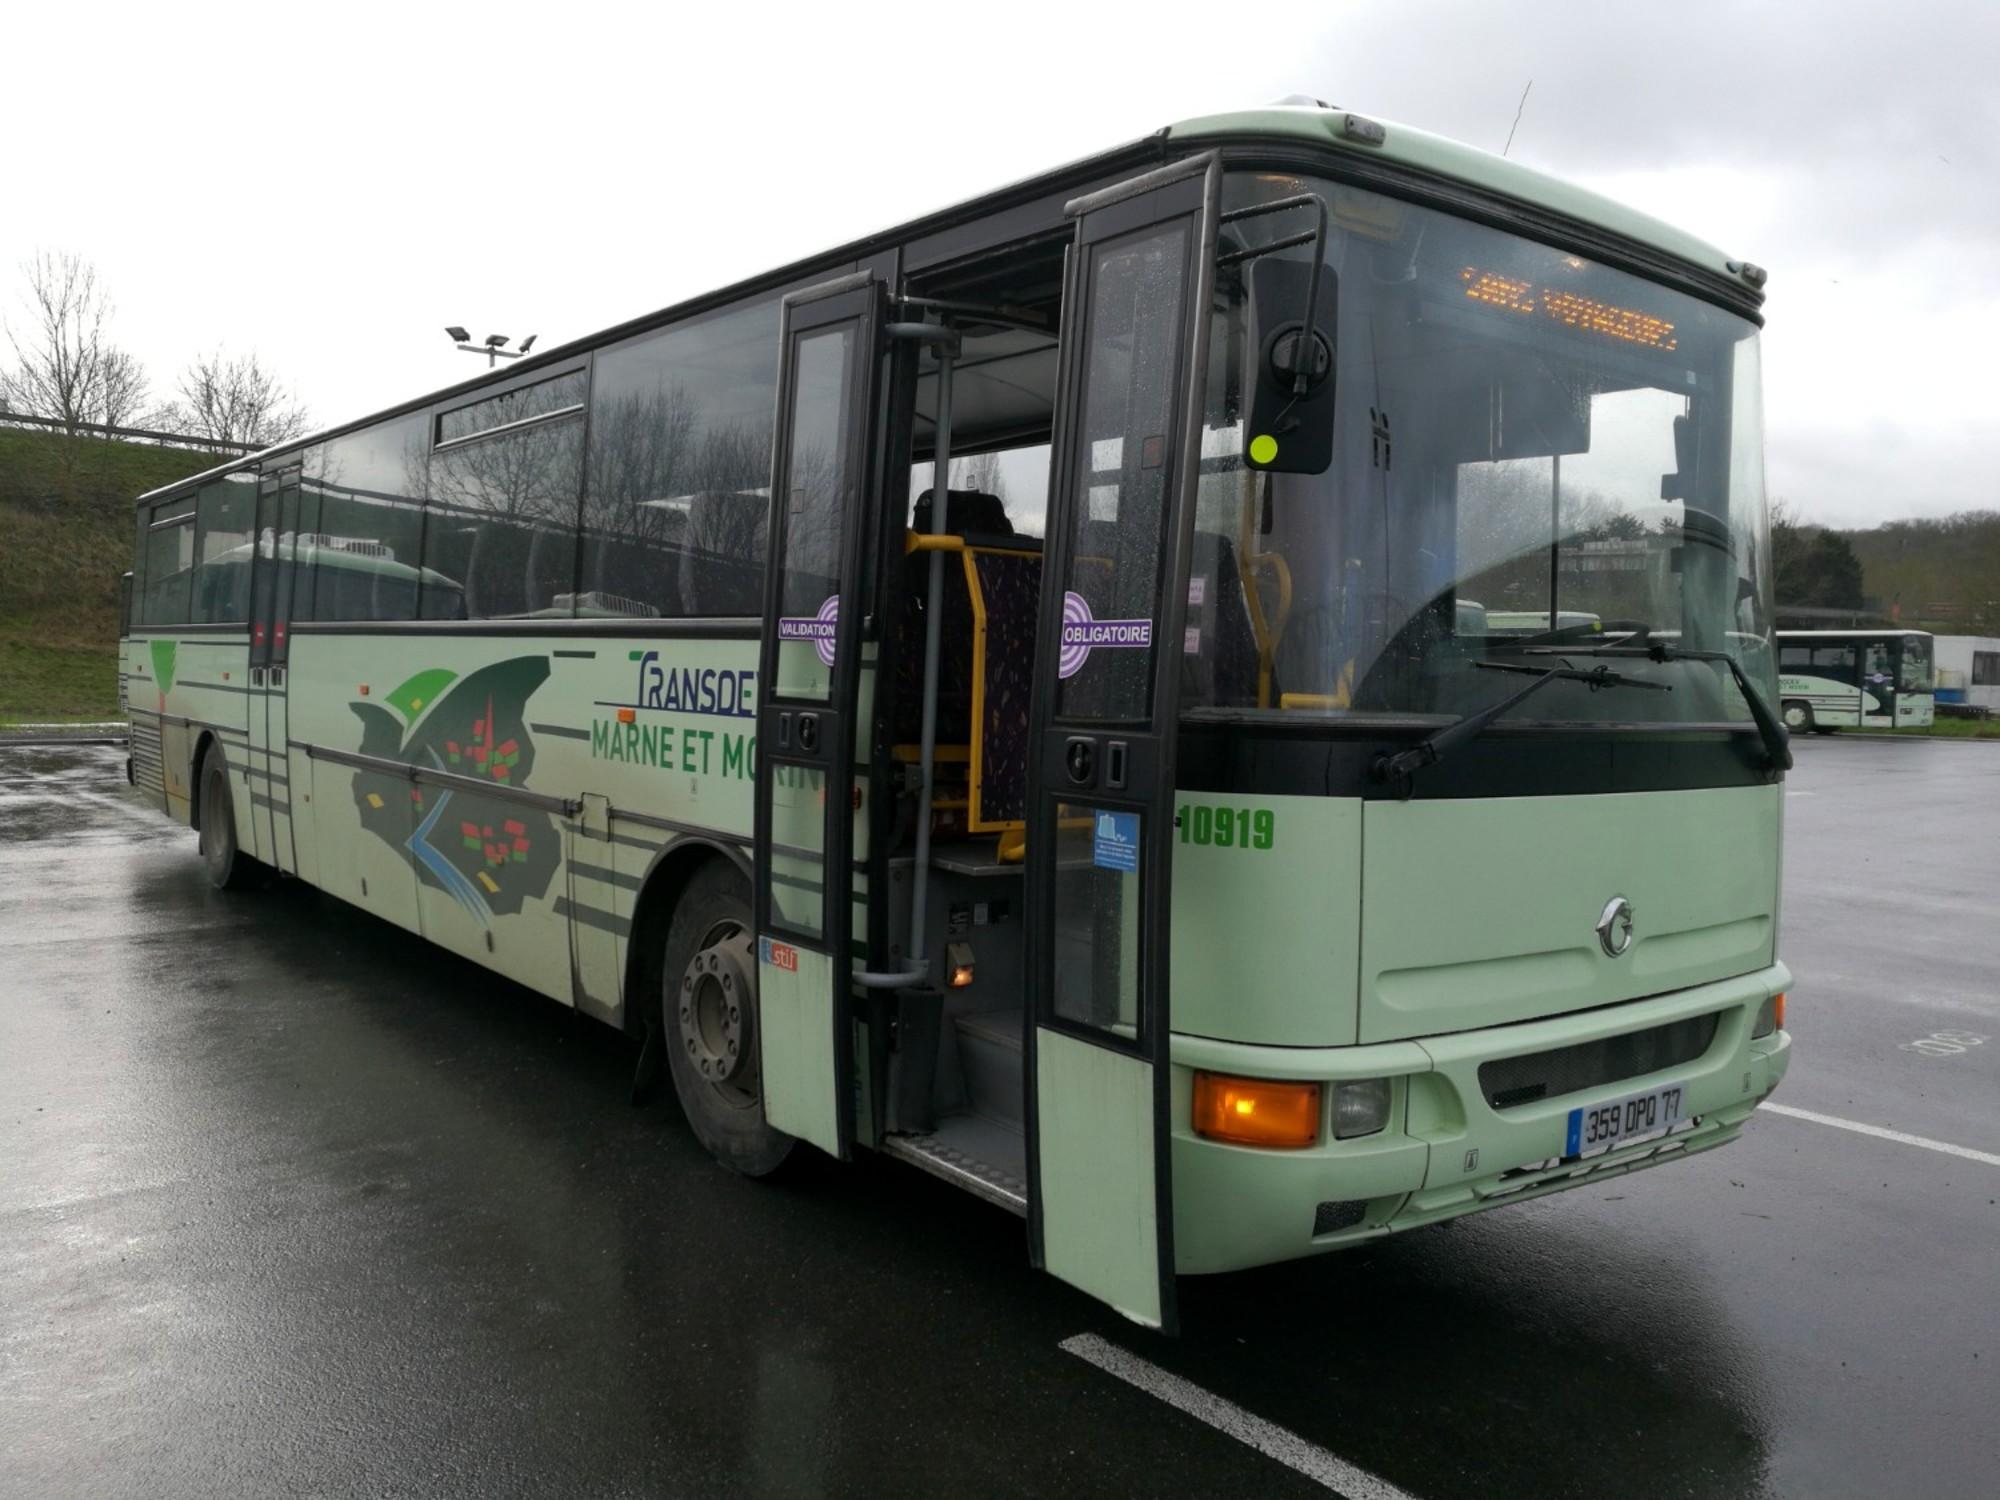 karosa recreo 10919 car bus d 39 occasion aux ench res agorastore. Black Bedroom Furniture Sets. Home Design Ideas